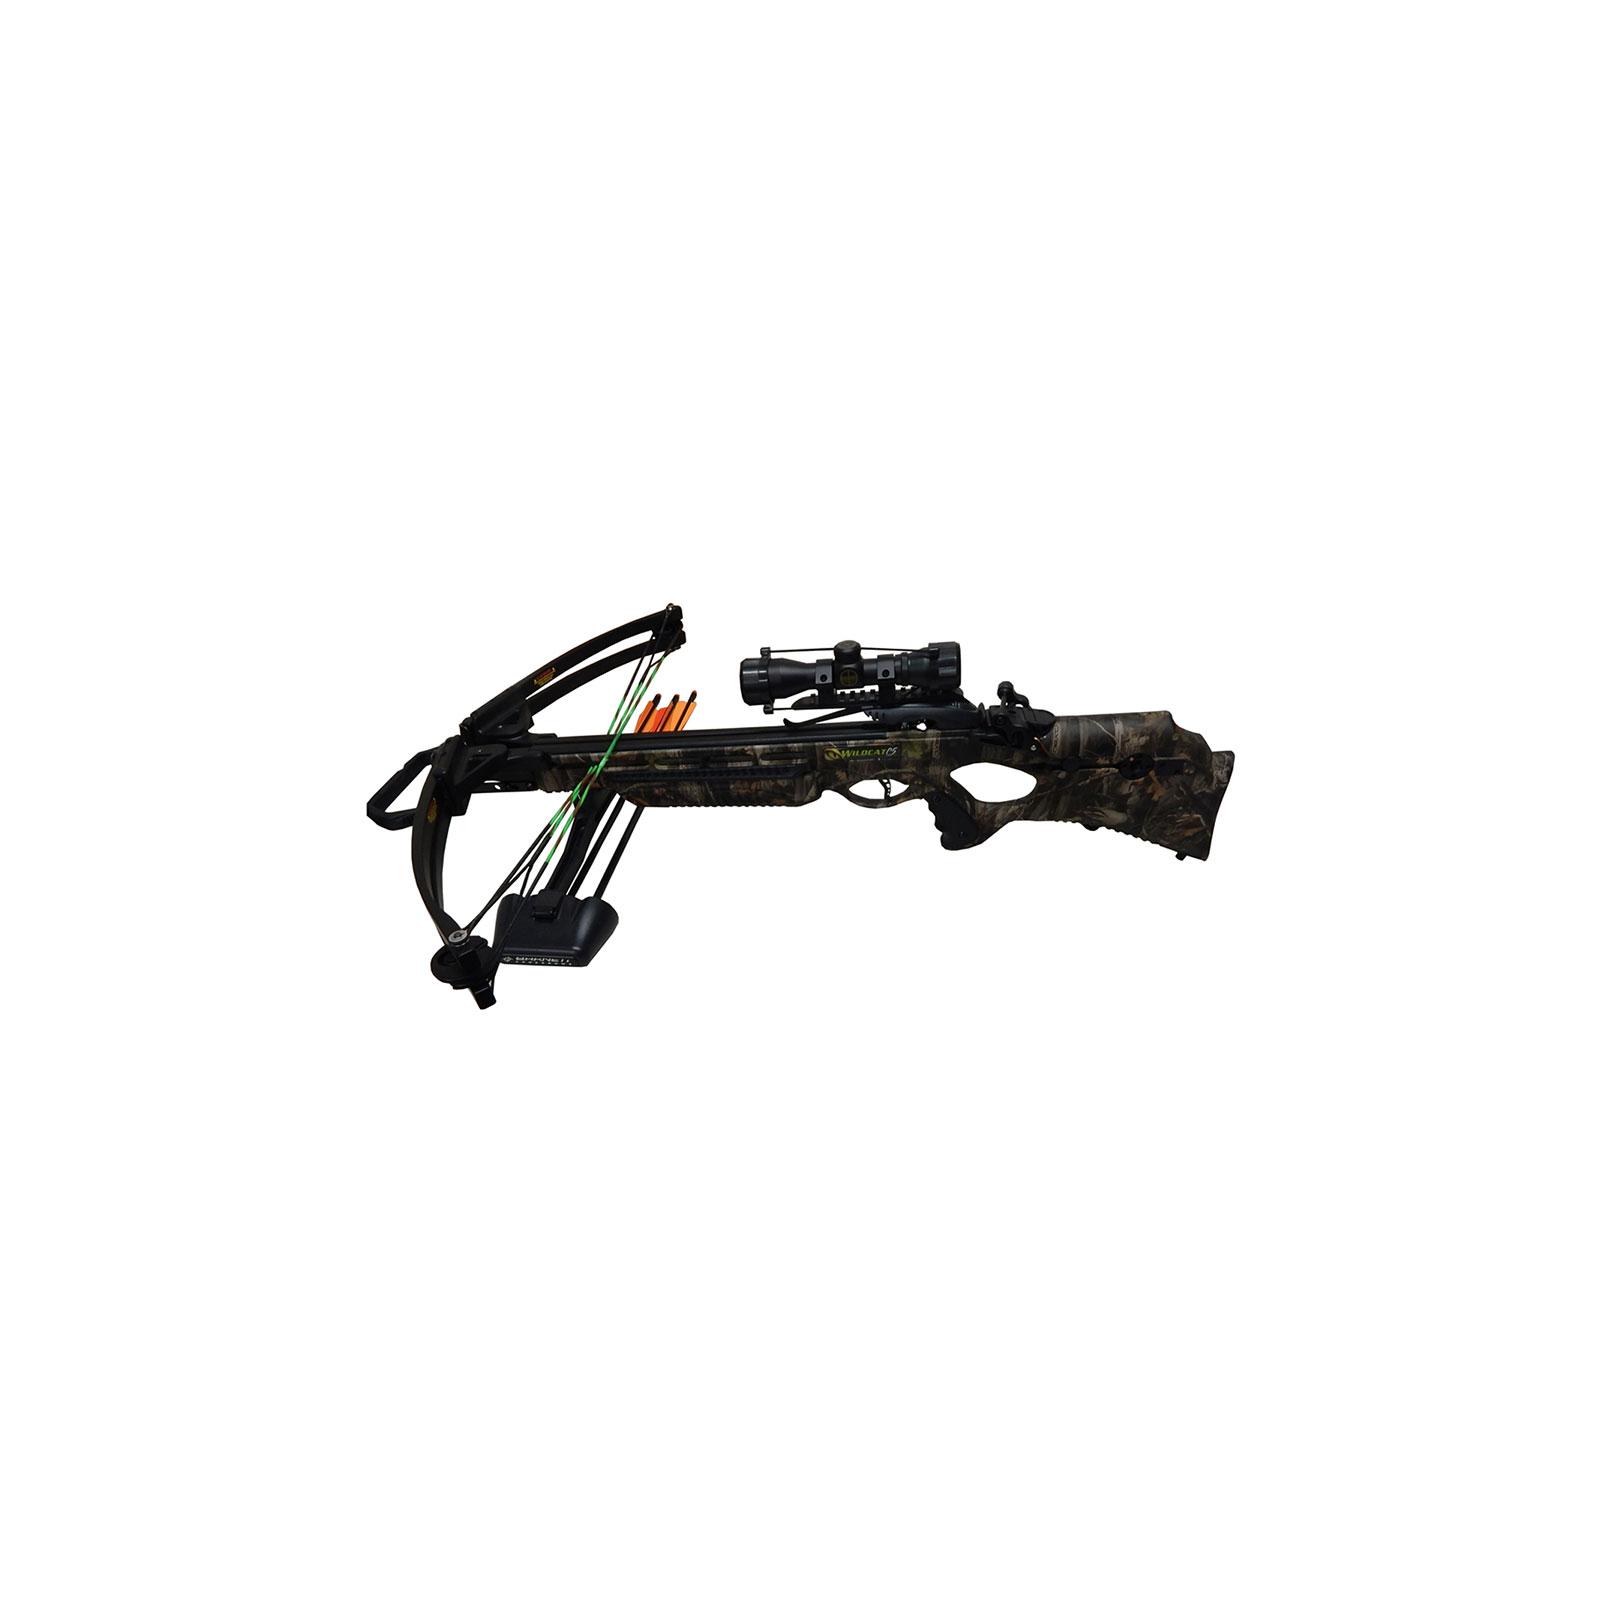 Barnett 78106 C5 Wildcat 4X32 Scope 150# Crossbow Package